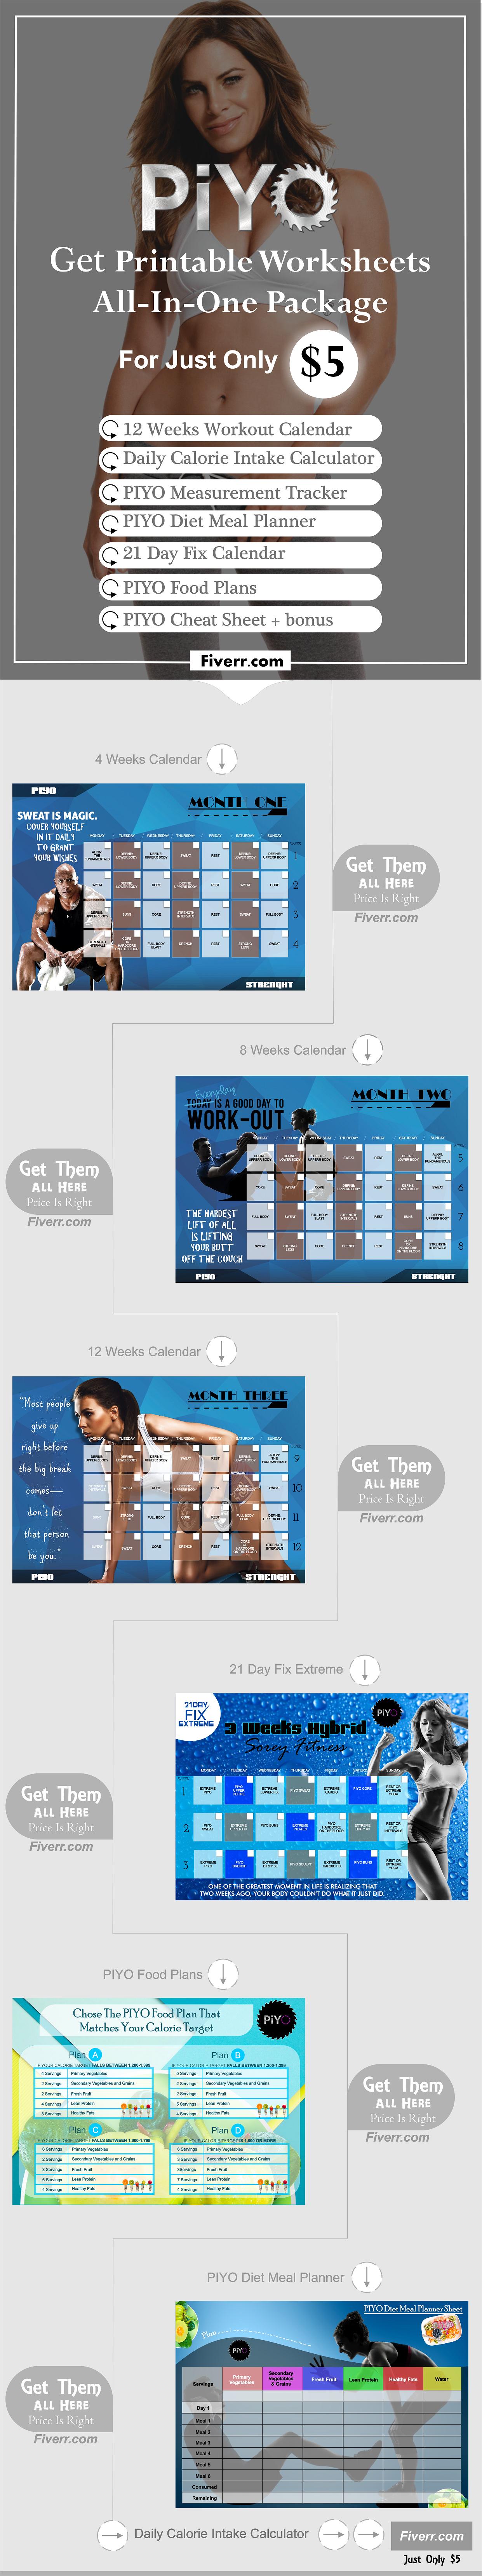 Get The All In One Package Piyo Printable Worksheet For